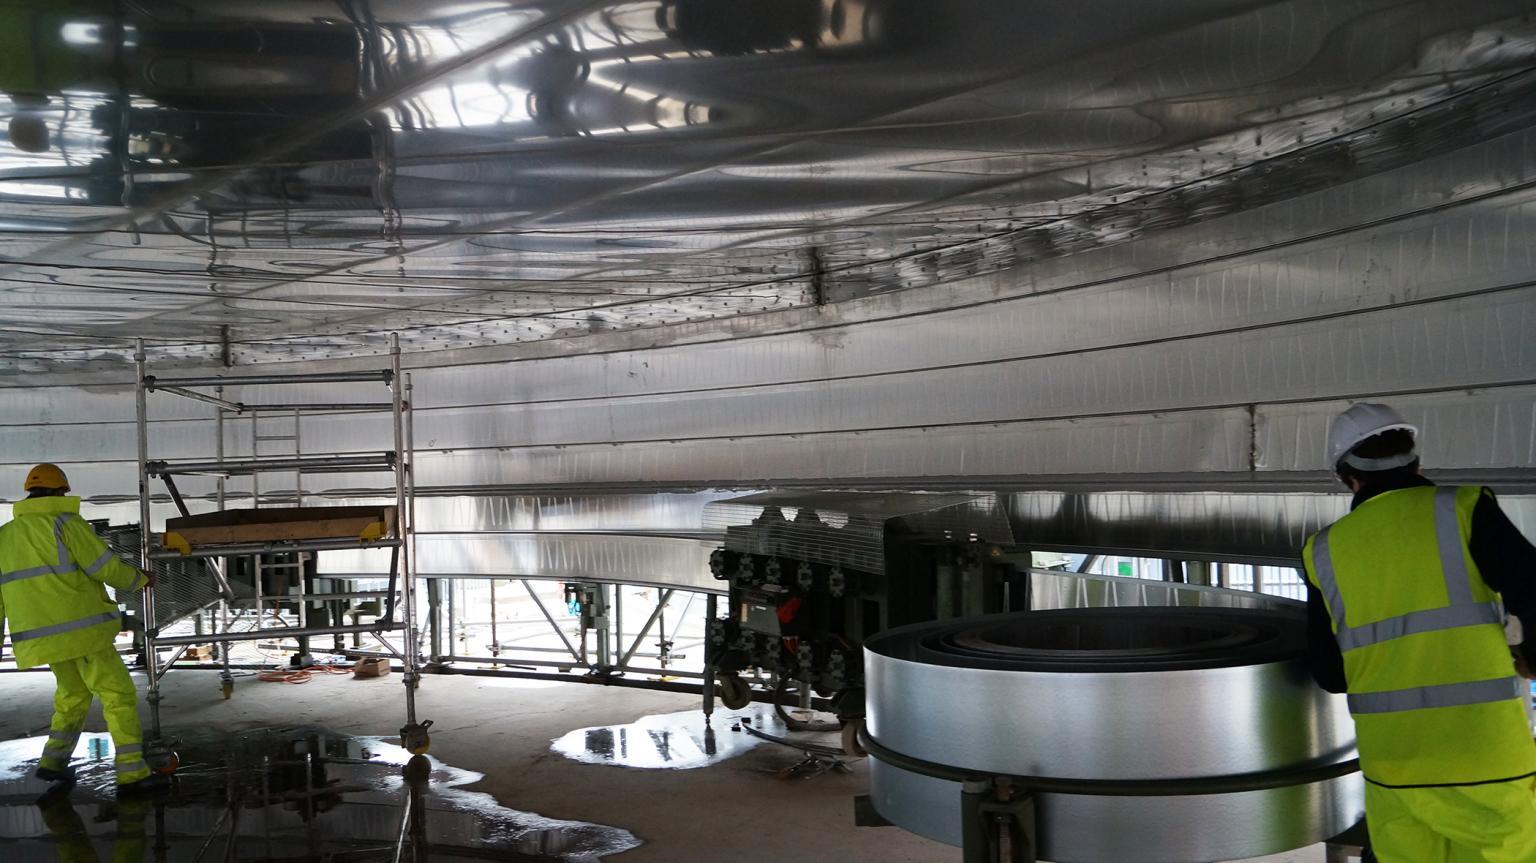 Lipp Spiral Seam tank construction system